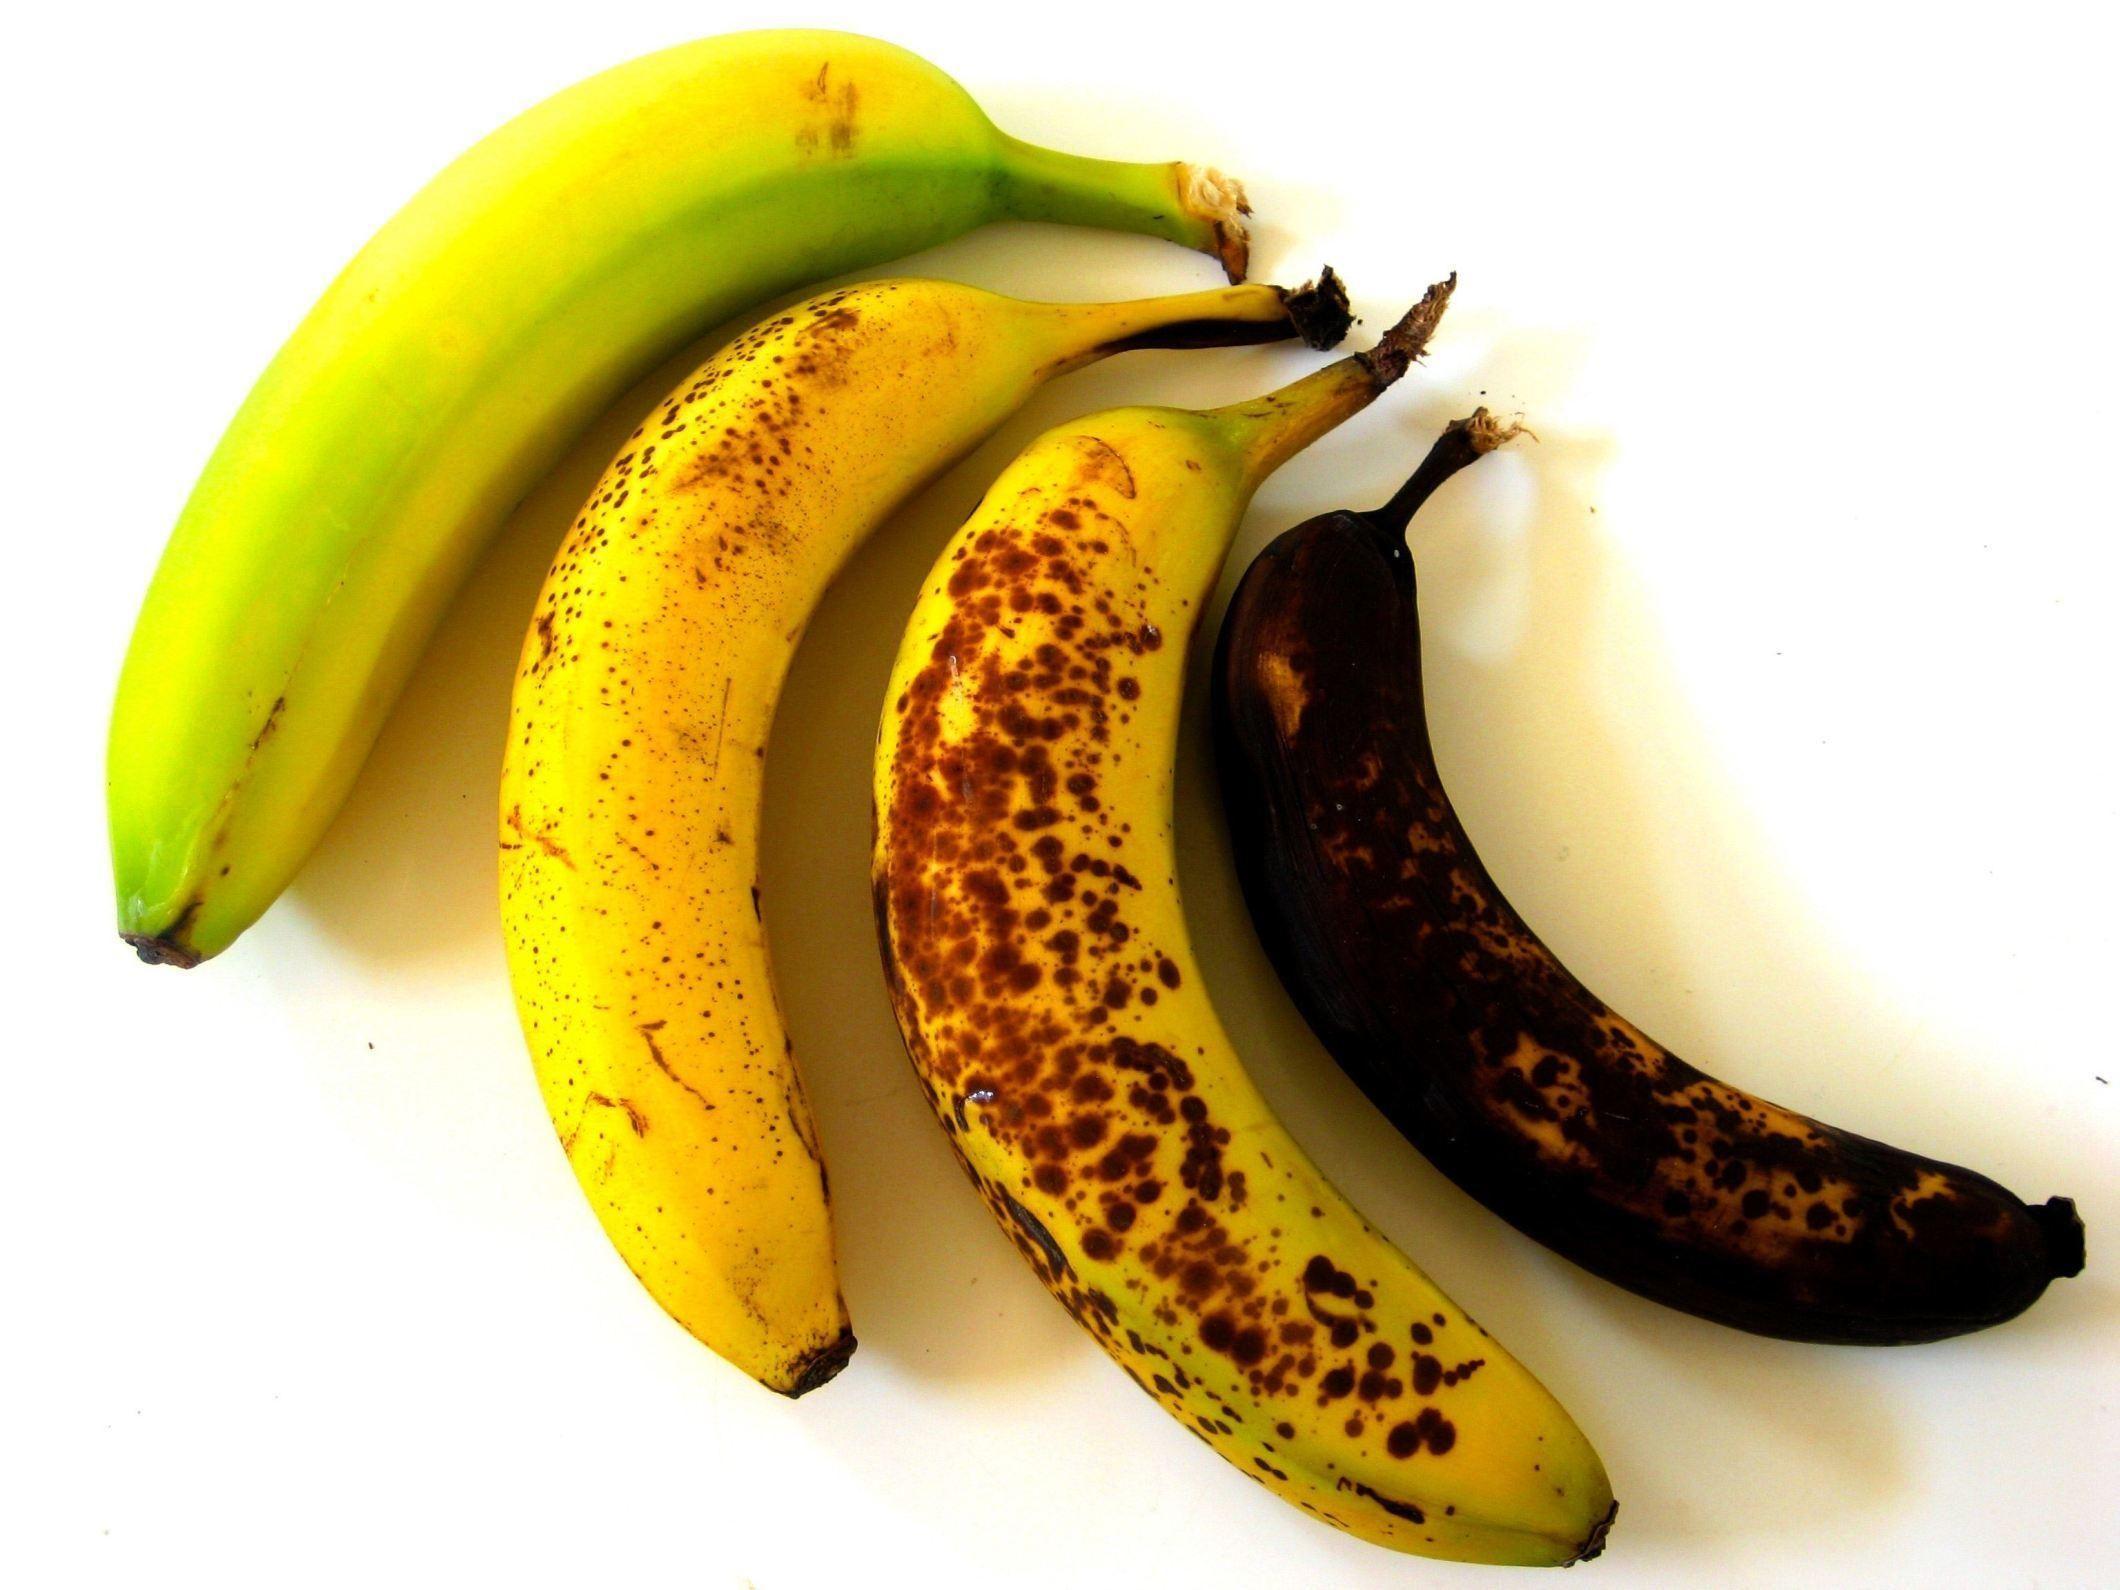 Are Green Bananas Bad For Diabetics?